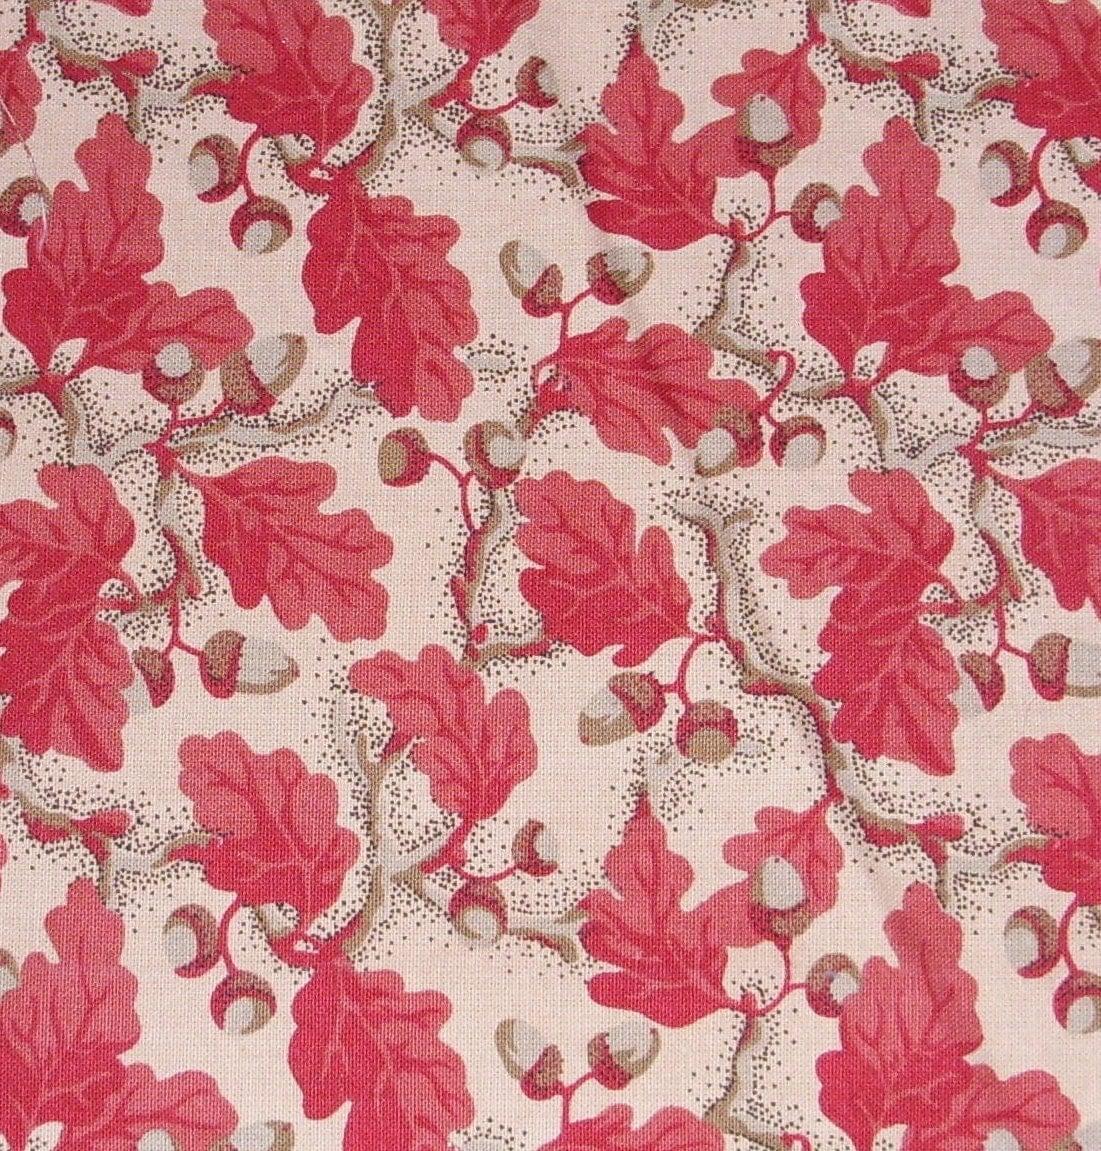 Oak leaf acorn cotton fabric remnants for Fabric remnants